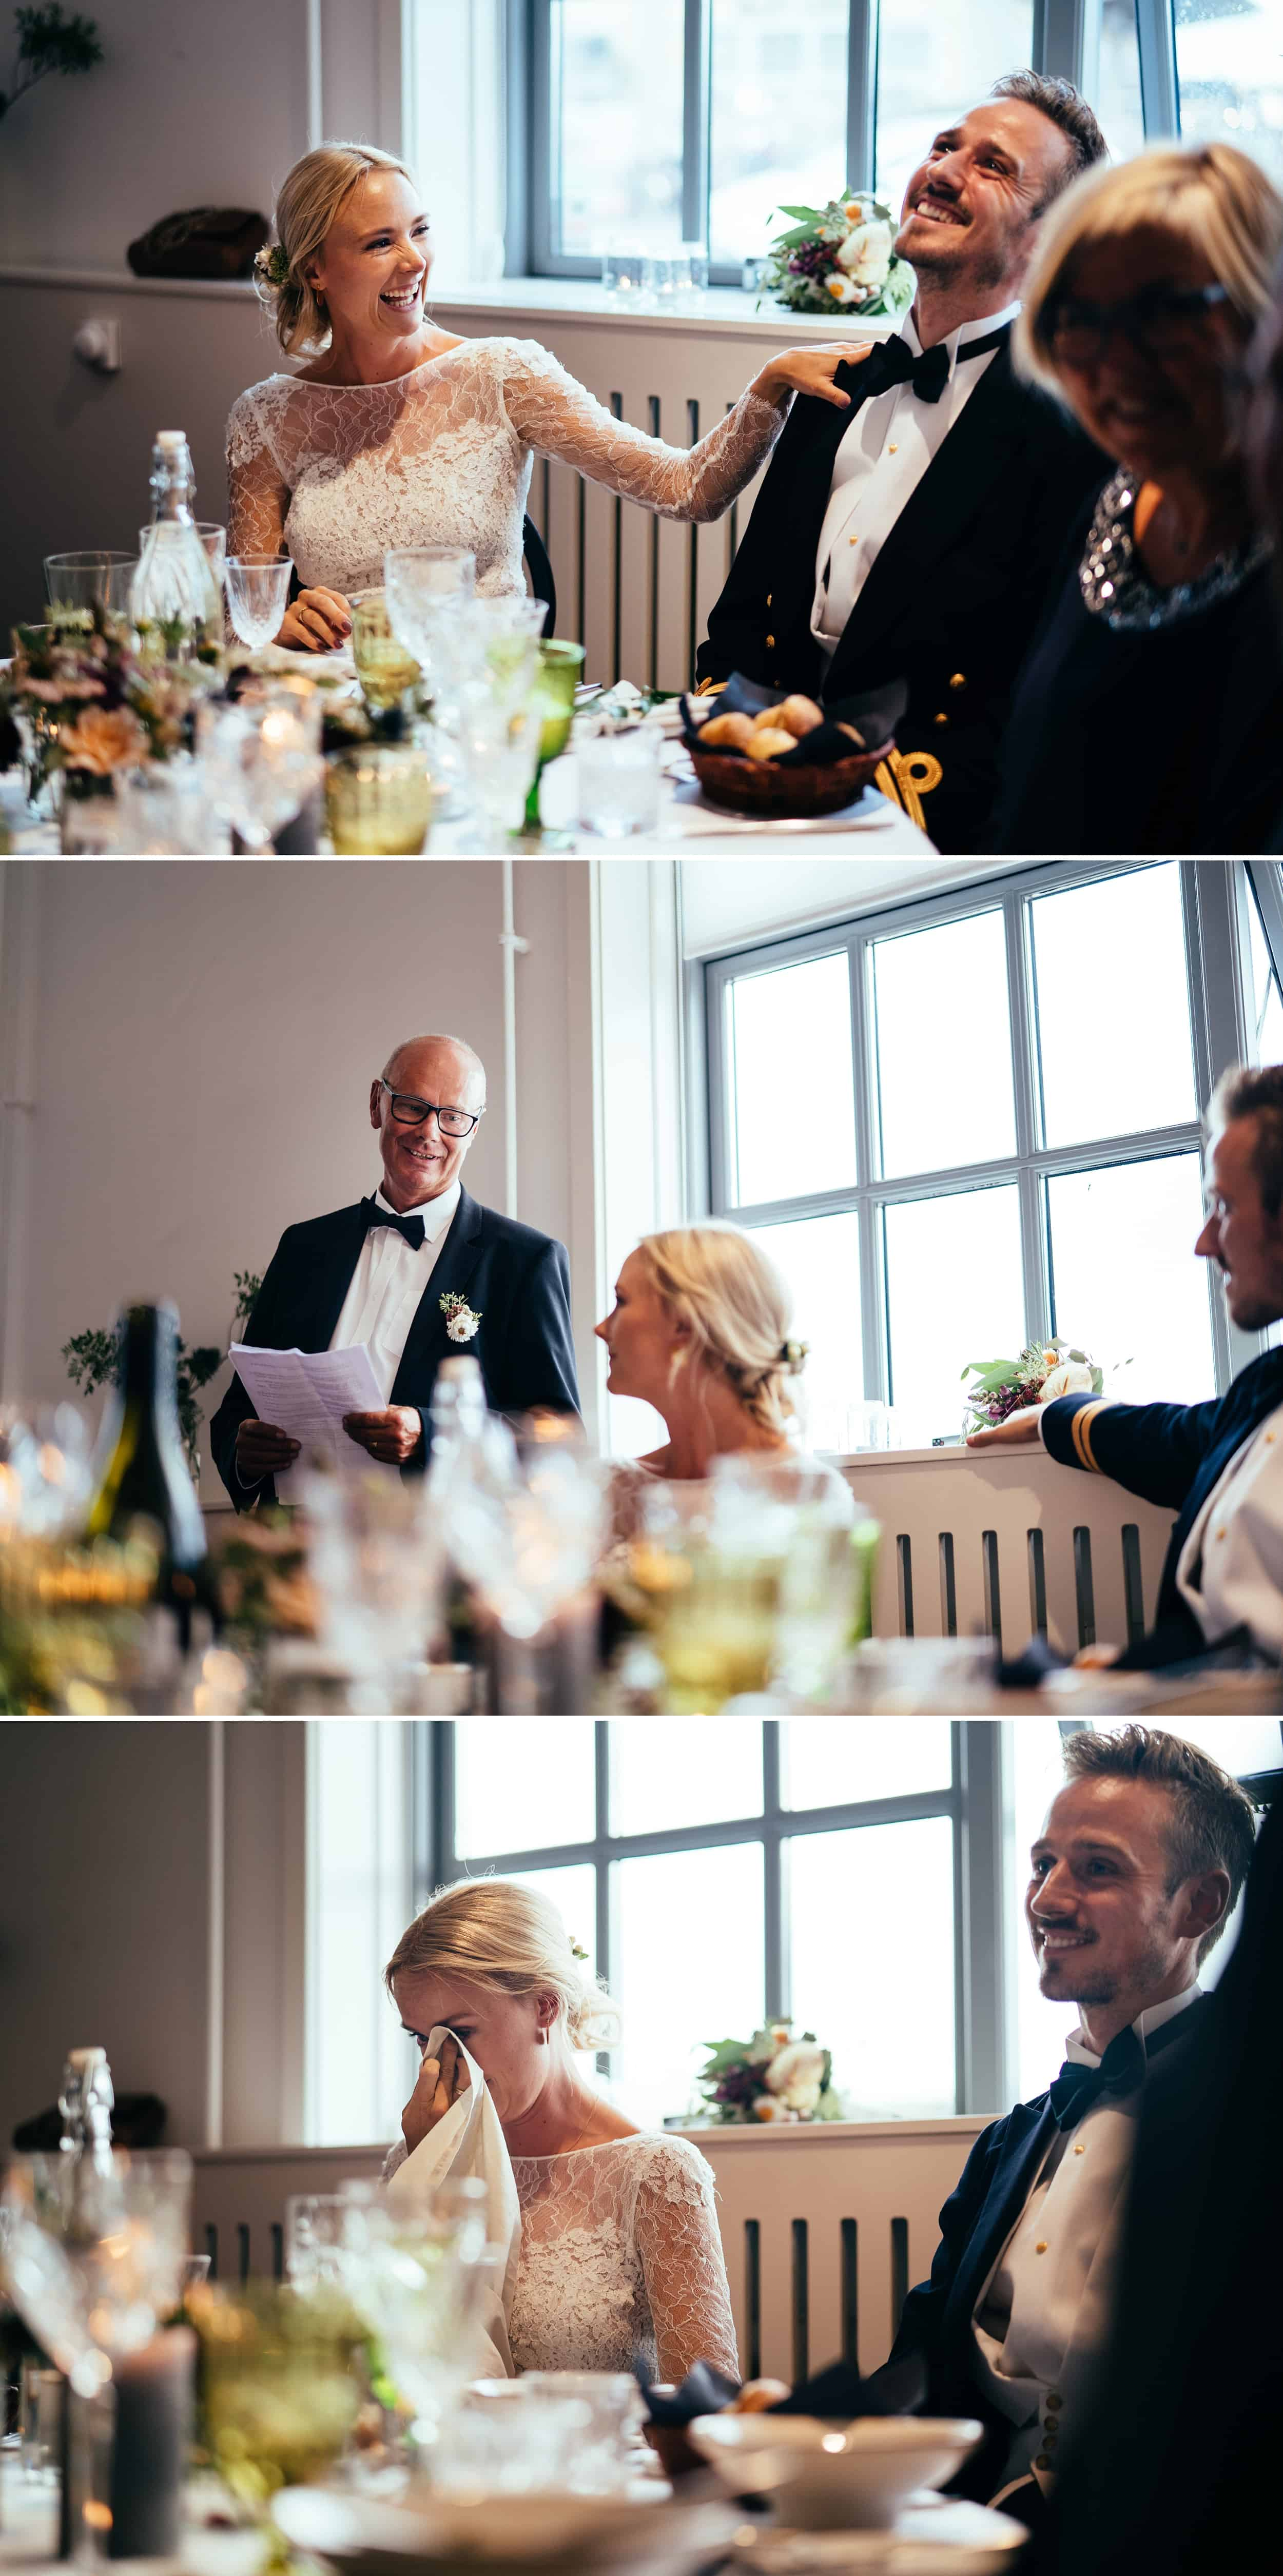 bryllupsmiddag-nordre-toldbod.jpg